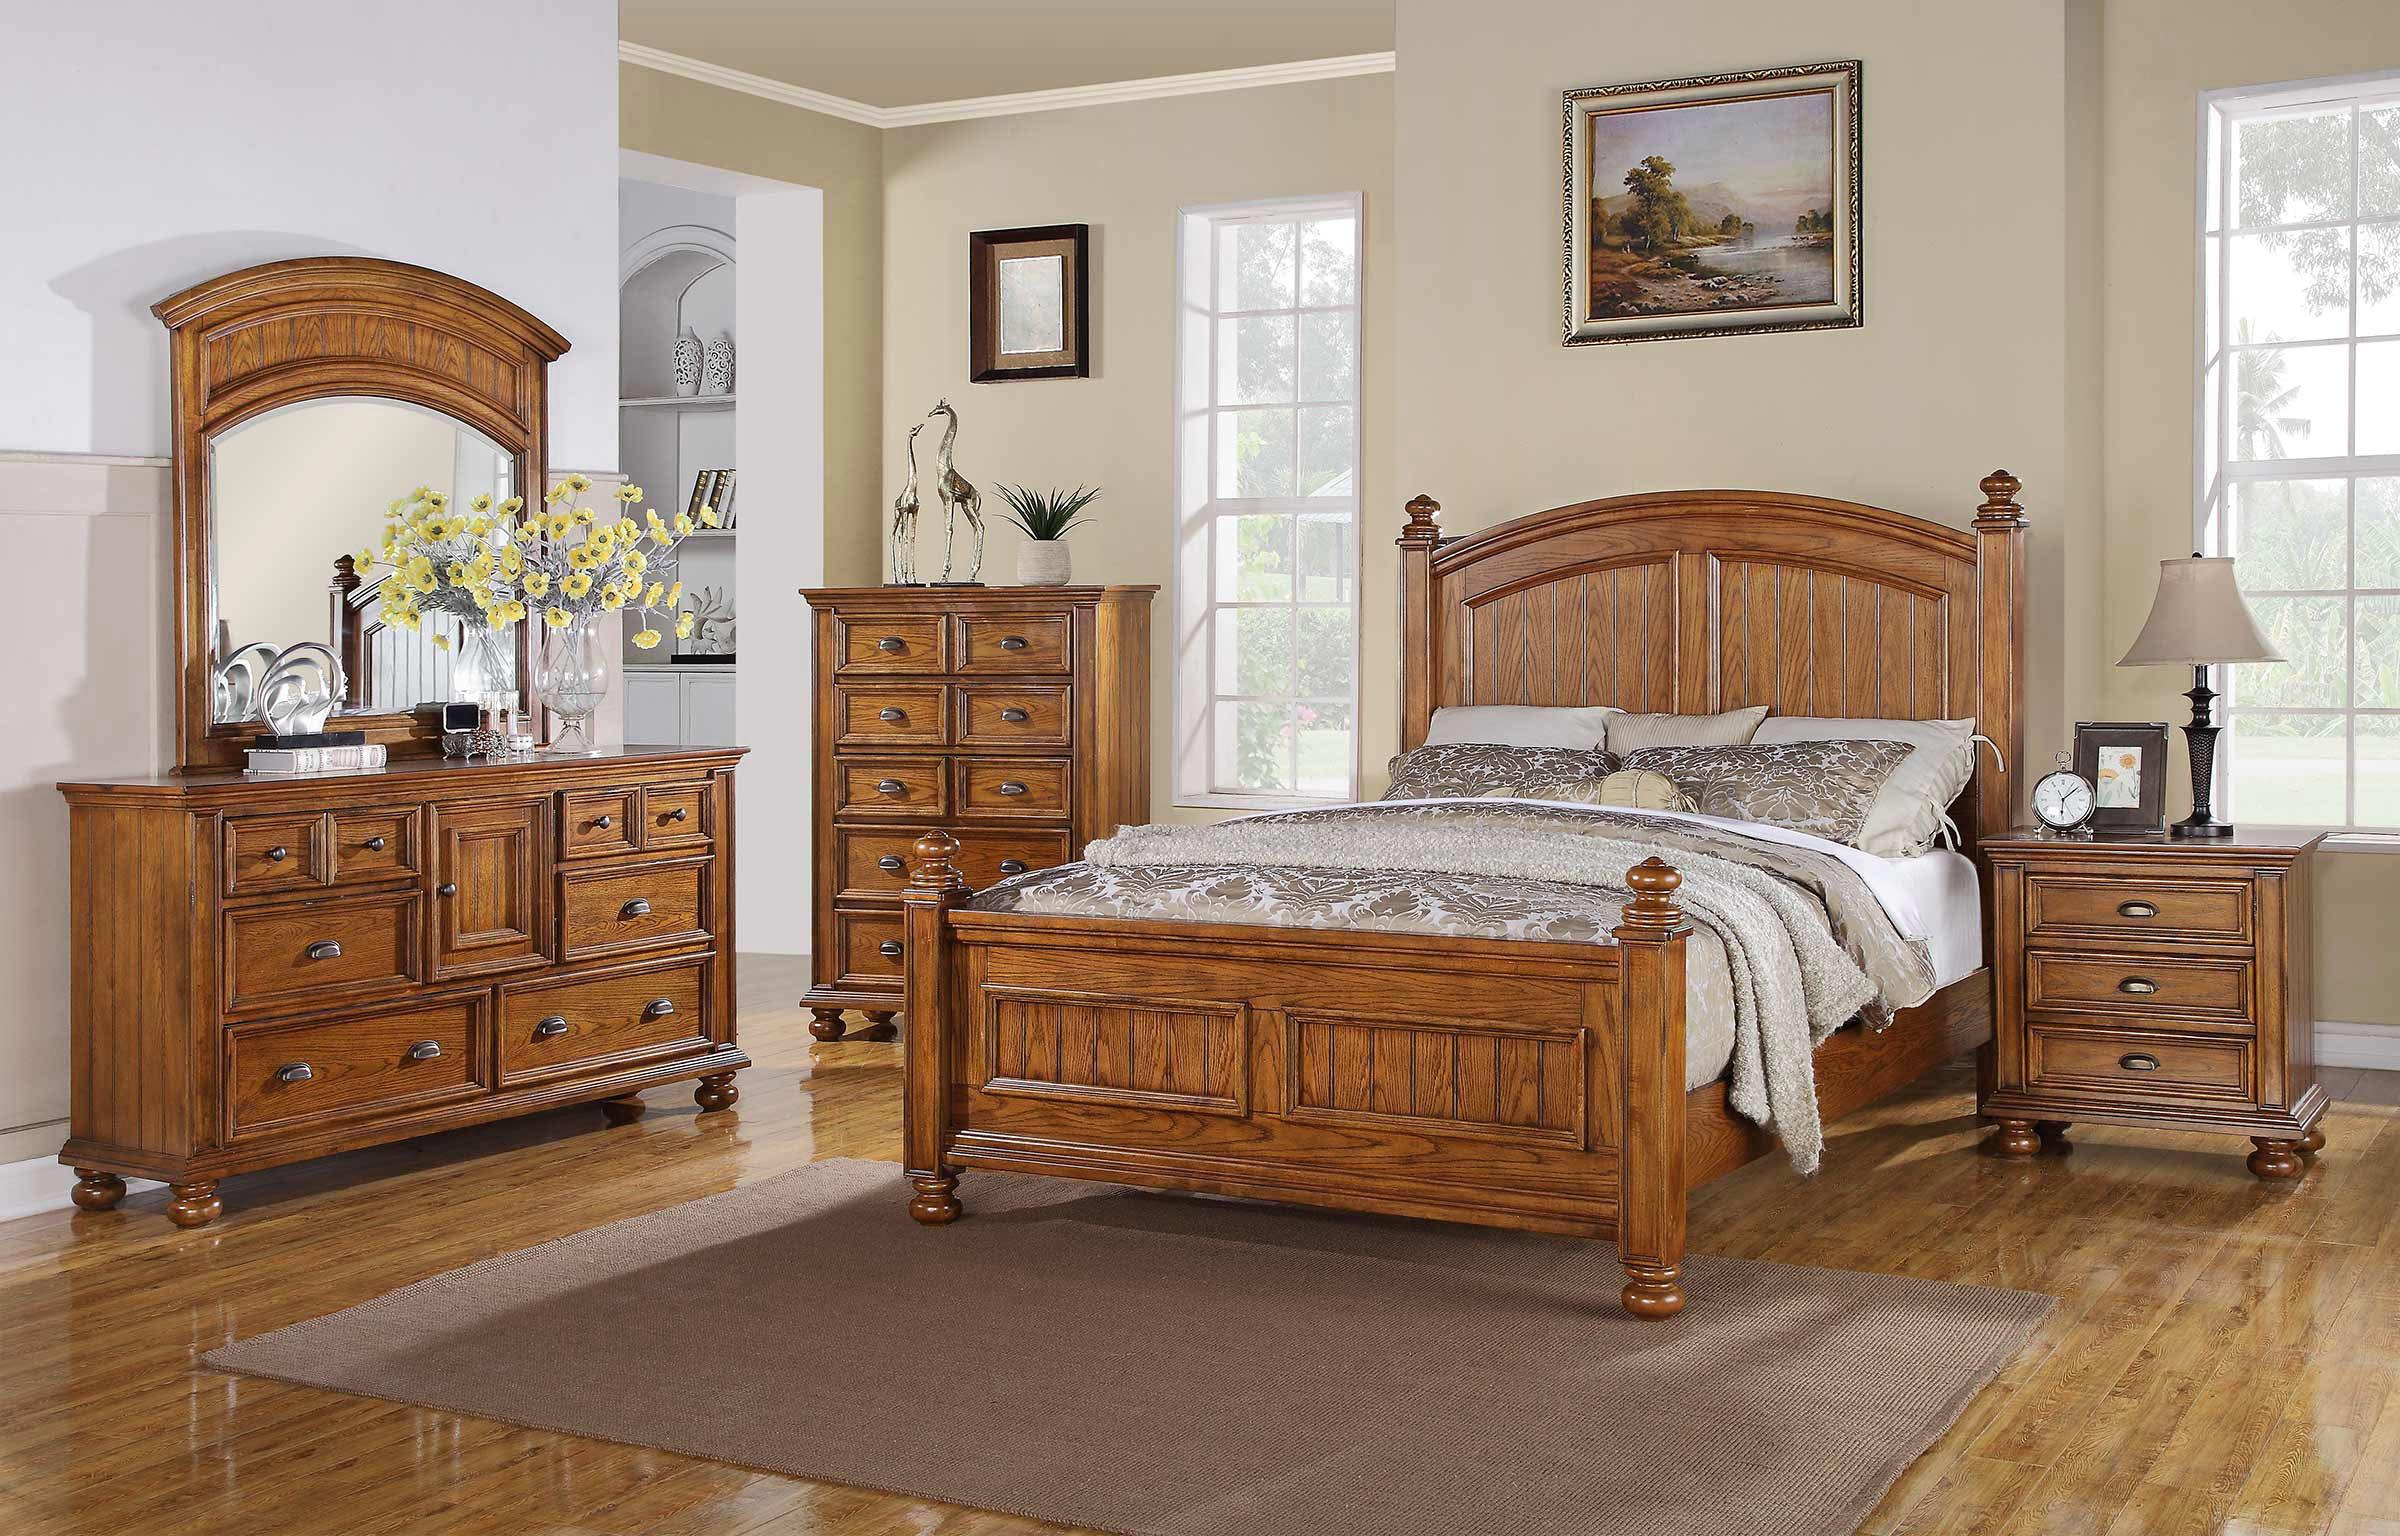 Whitmire's Furniture image 7